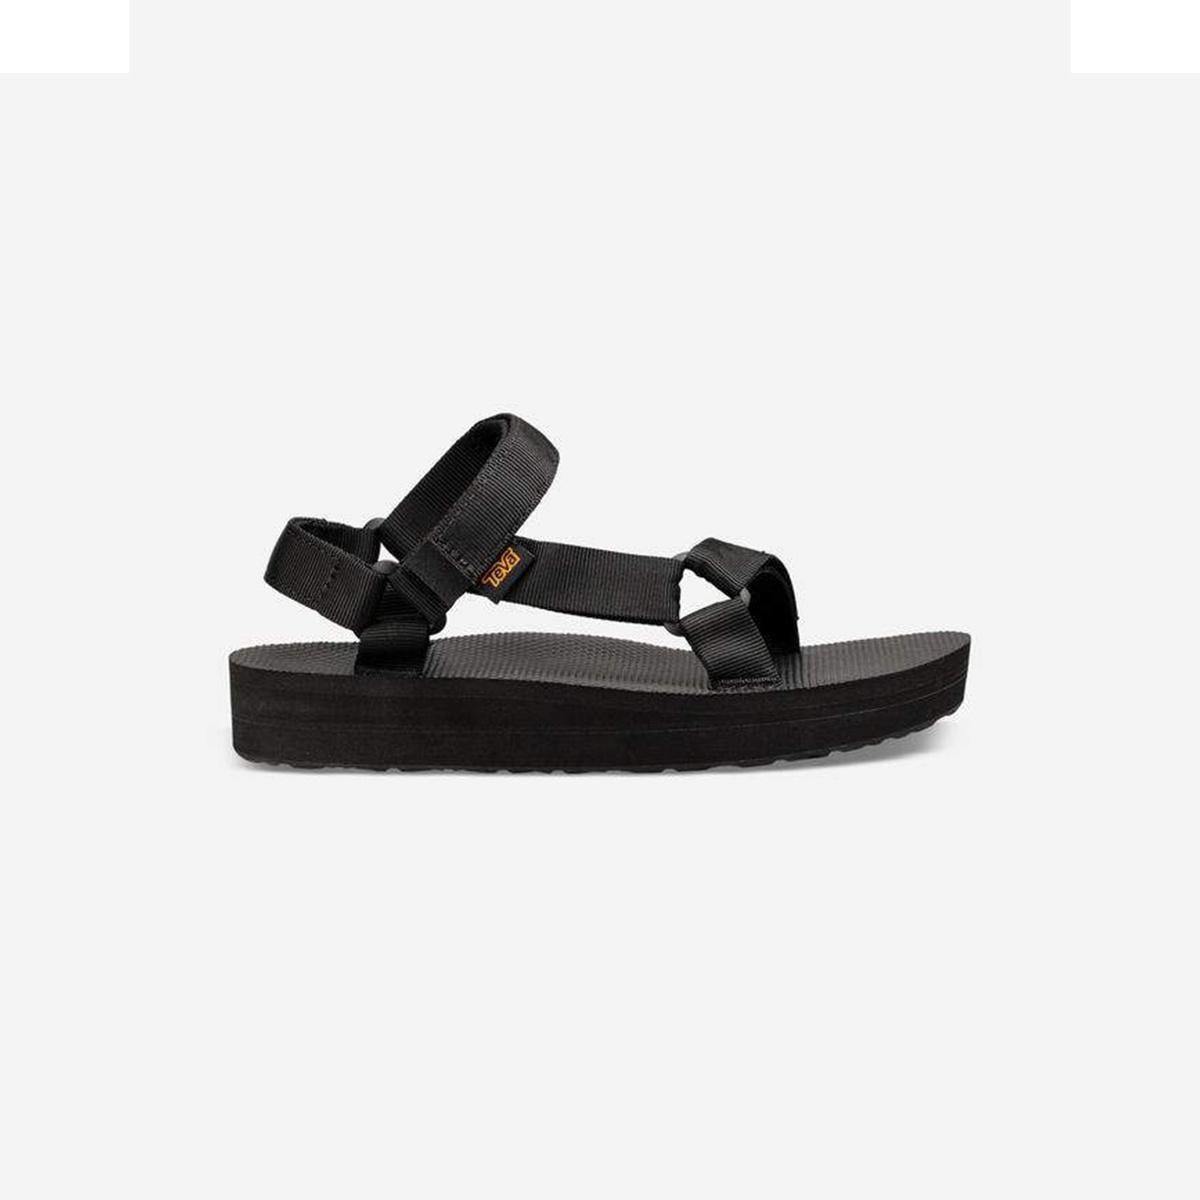 4f3f8861179b 97+ Original Universal Men S Sandal Teva. Teva Hudson Sandal Men S ...